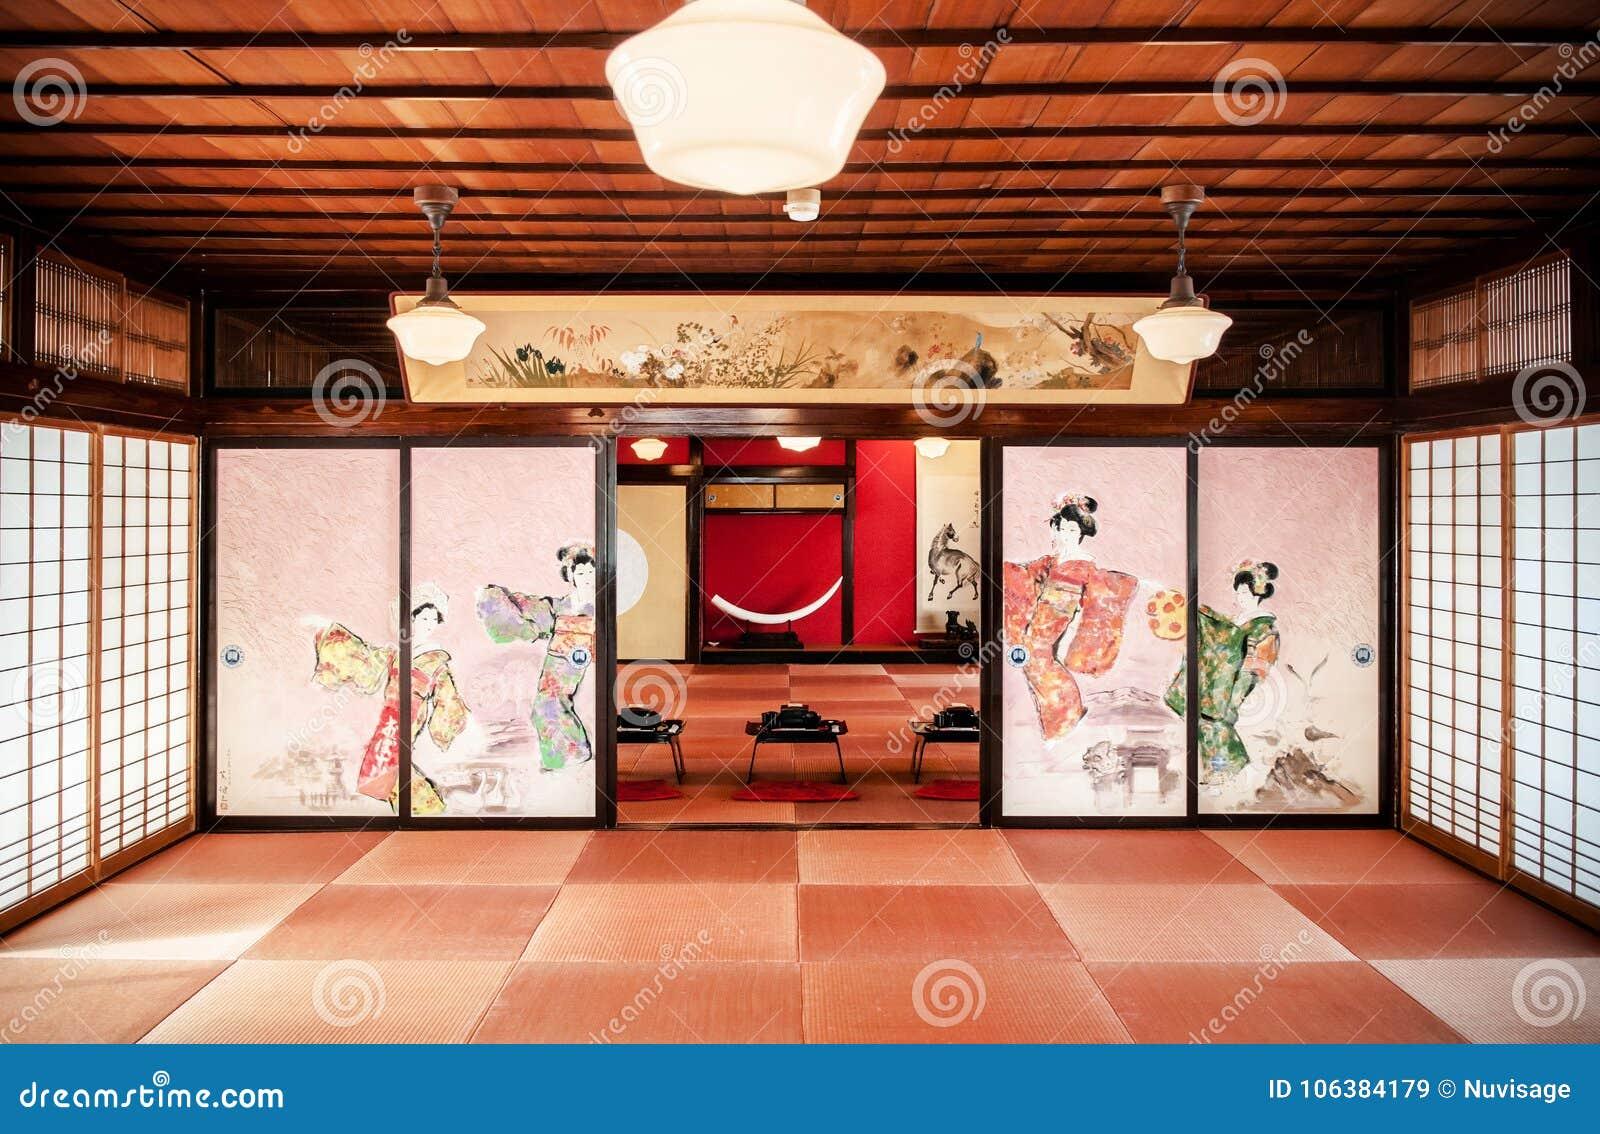 Jan 23 2014 sakata yamagata japan japanese vintage tea room with wall painting and traditional decoration tables and seat pad